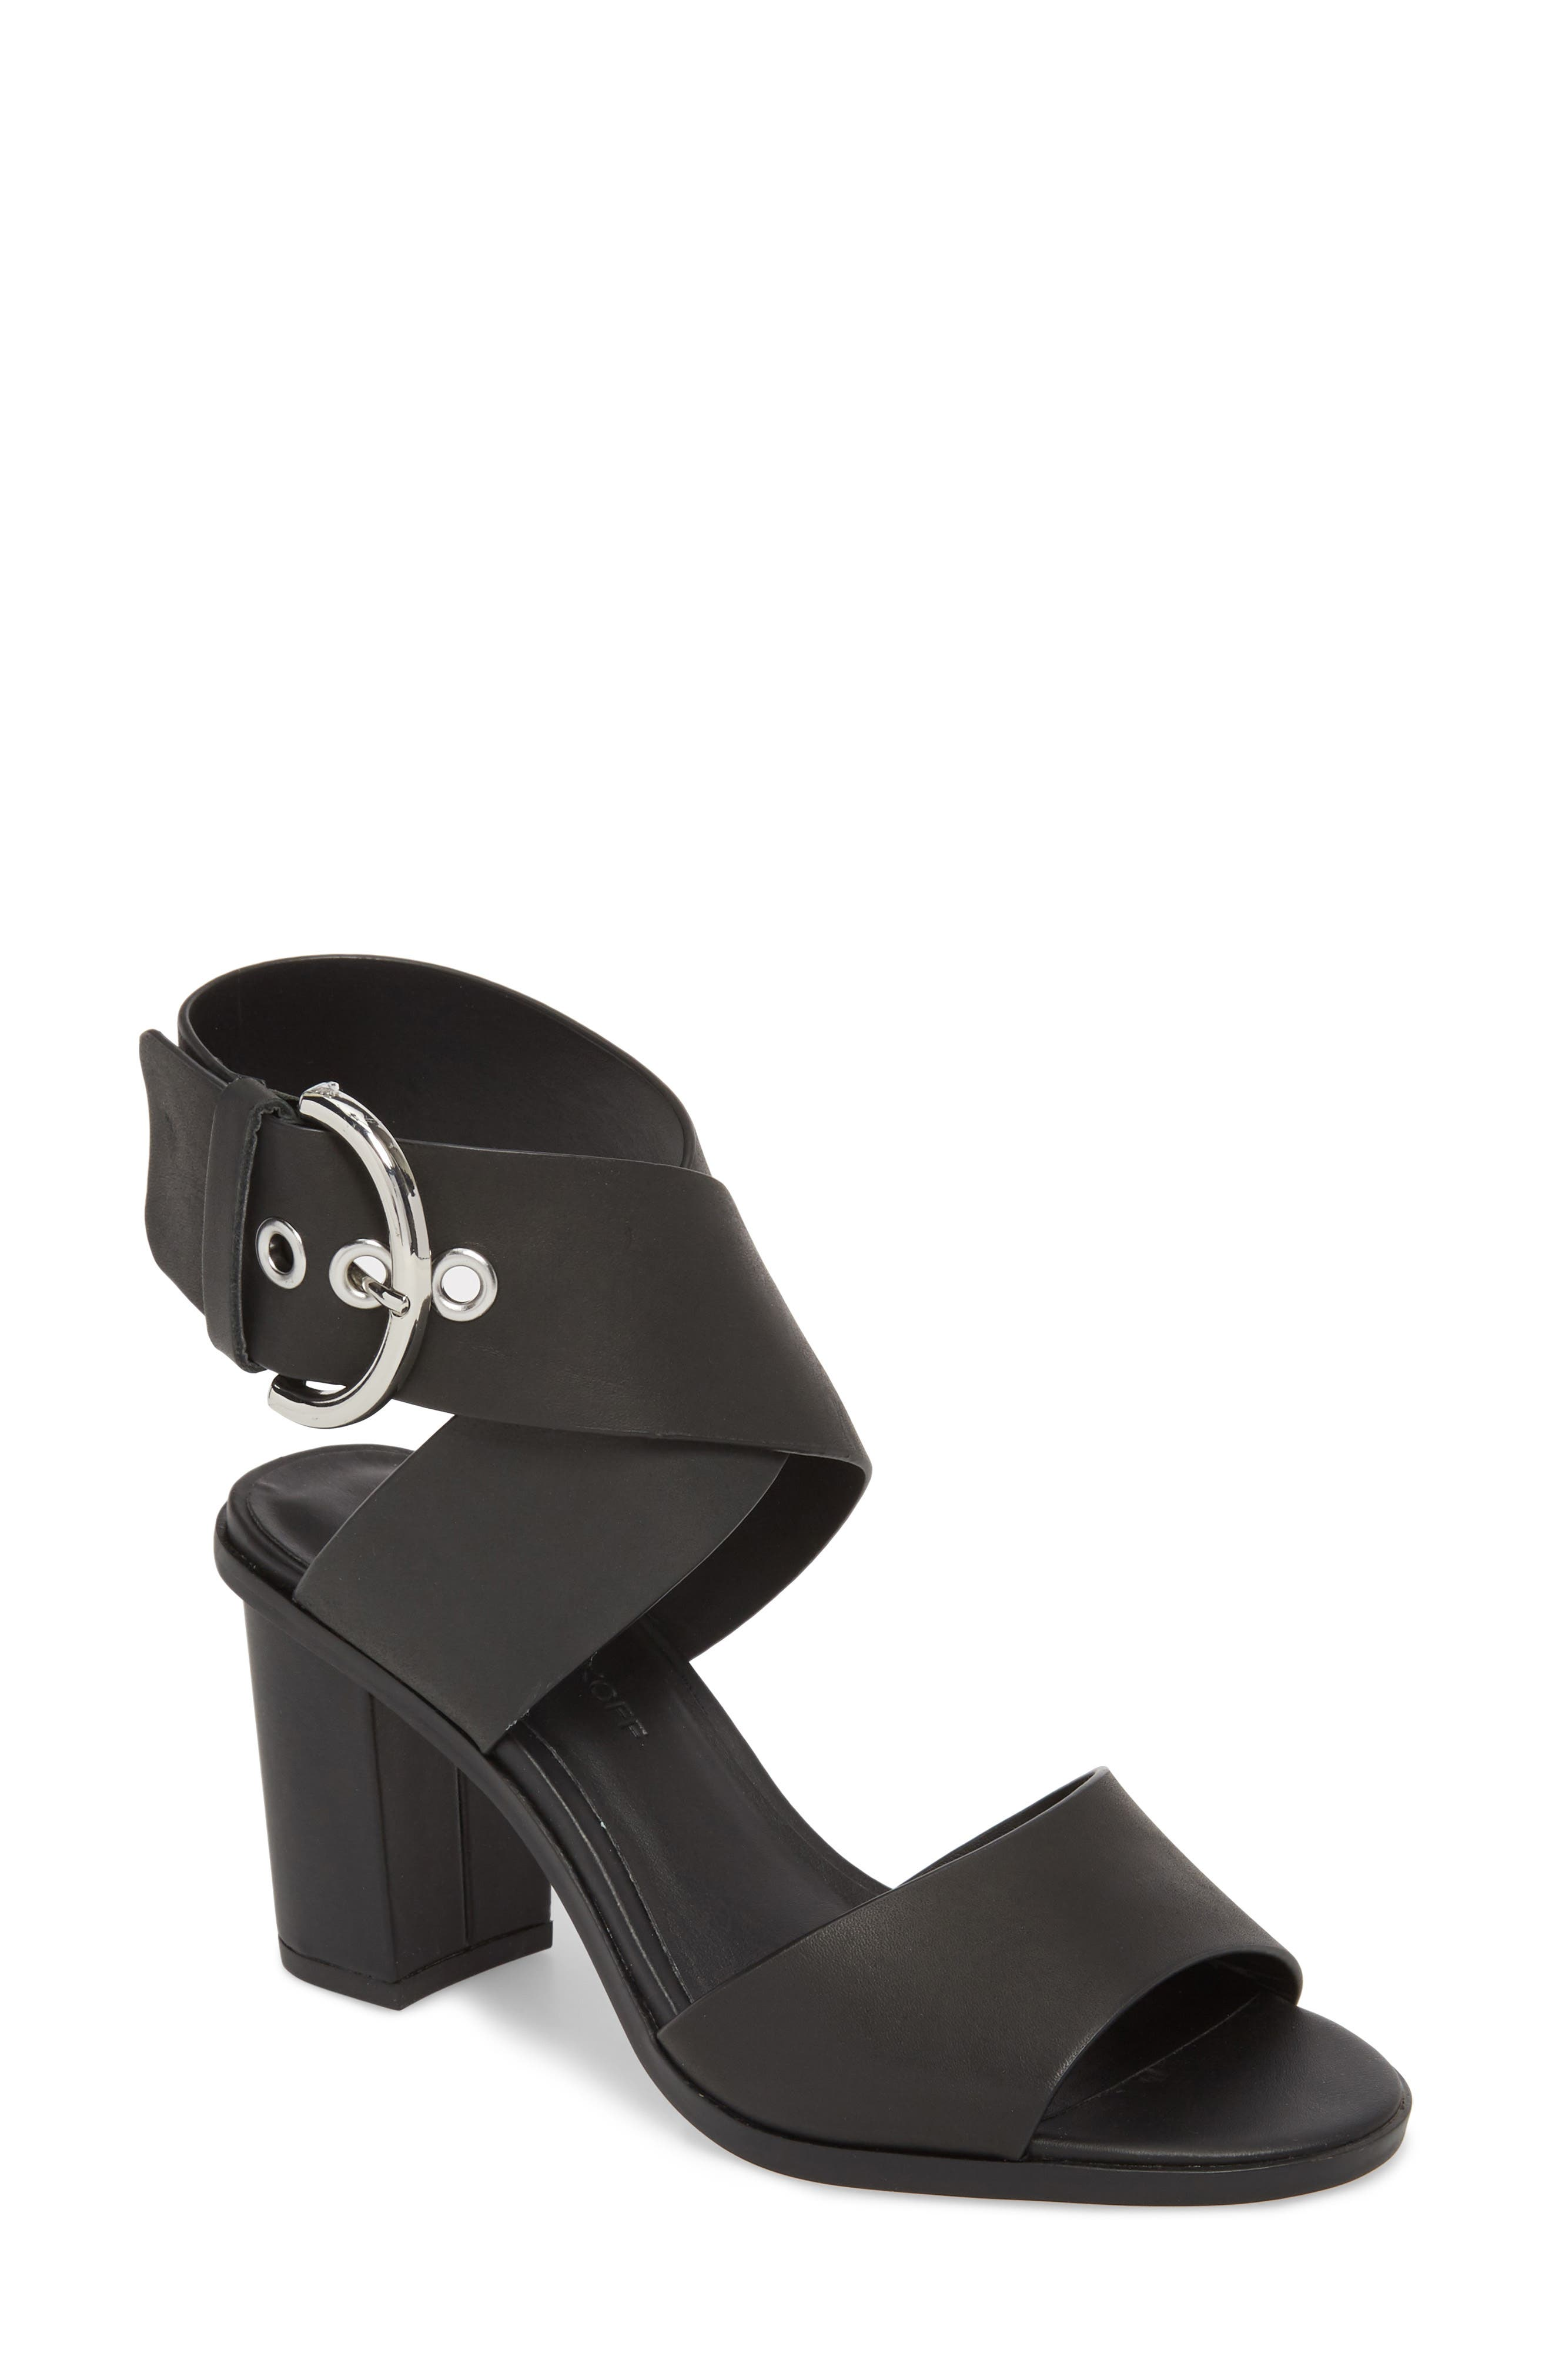 Valaree Sandal,                         Main,                         color, Black Leather